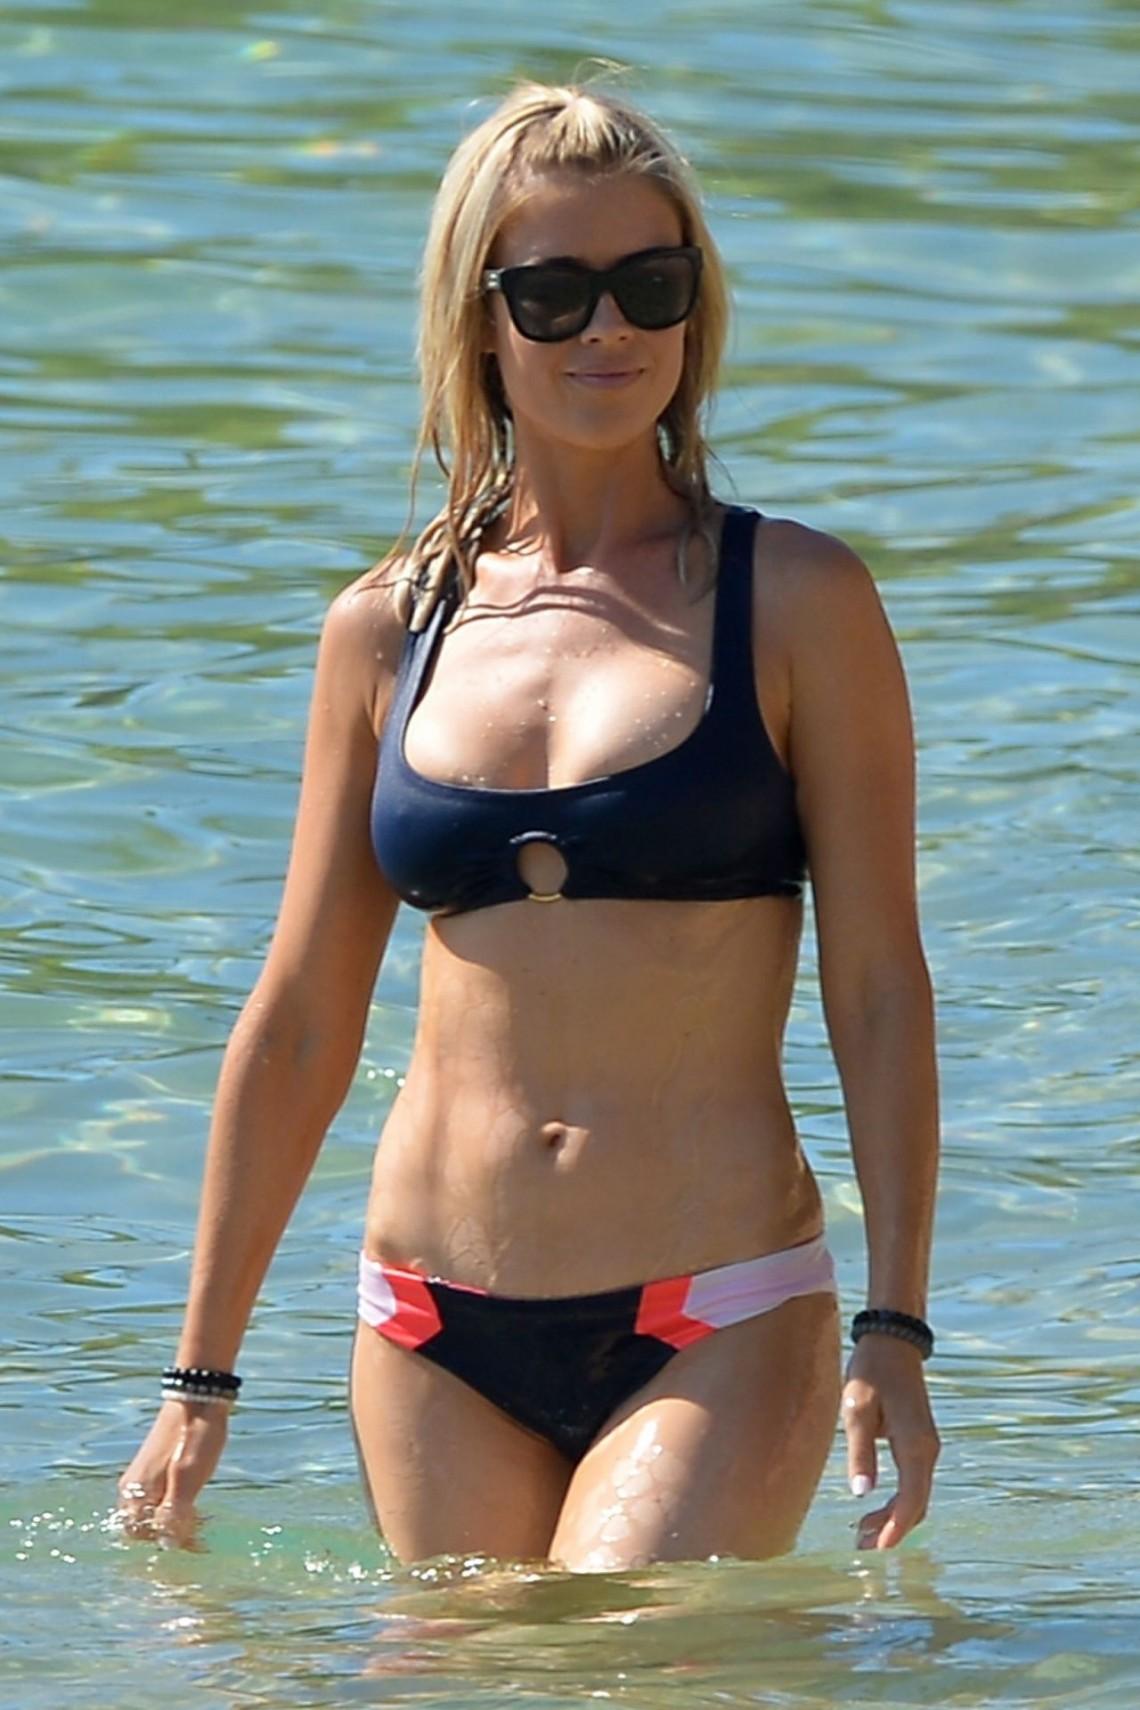 49 Hottest Christina El Moussa Big Butt pictures Which